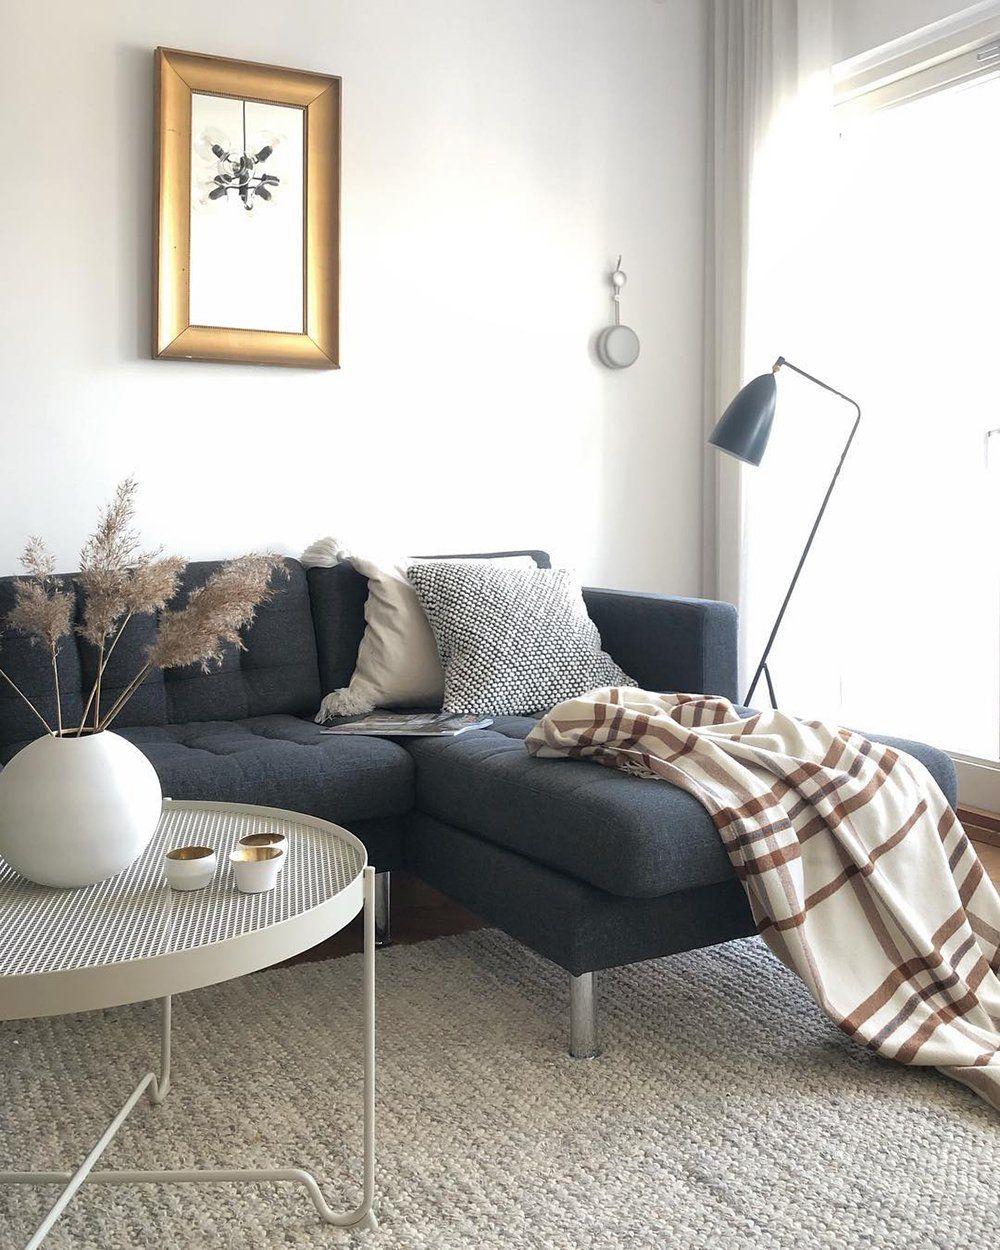 Grasshopper floor lamp replica – mooielight | Wohnzimmer